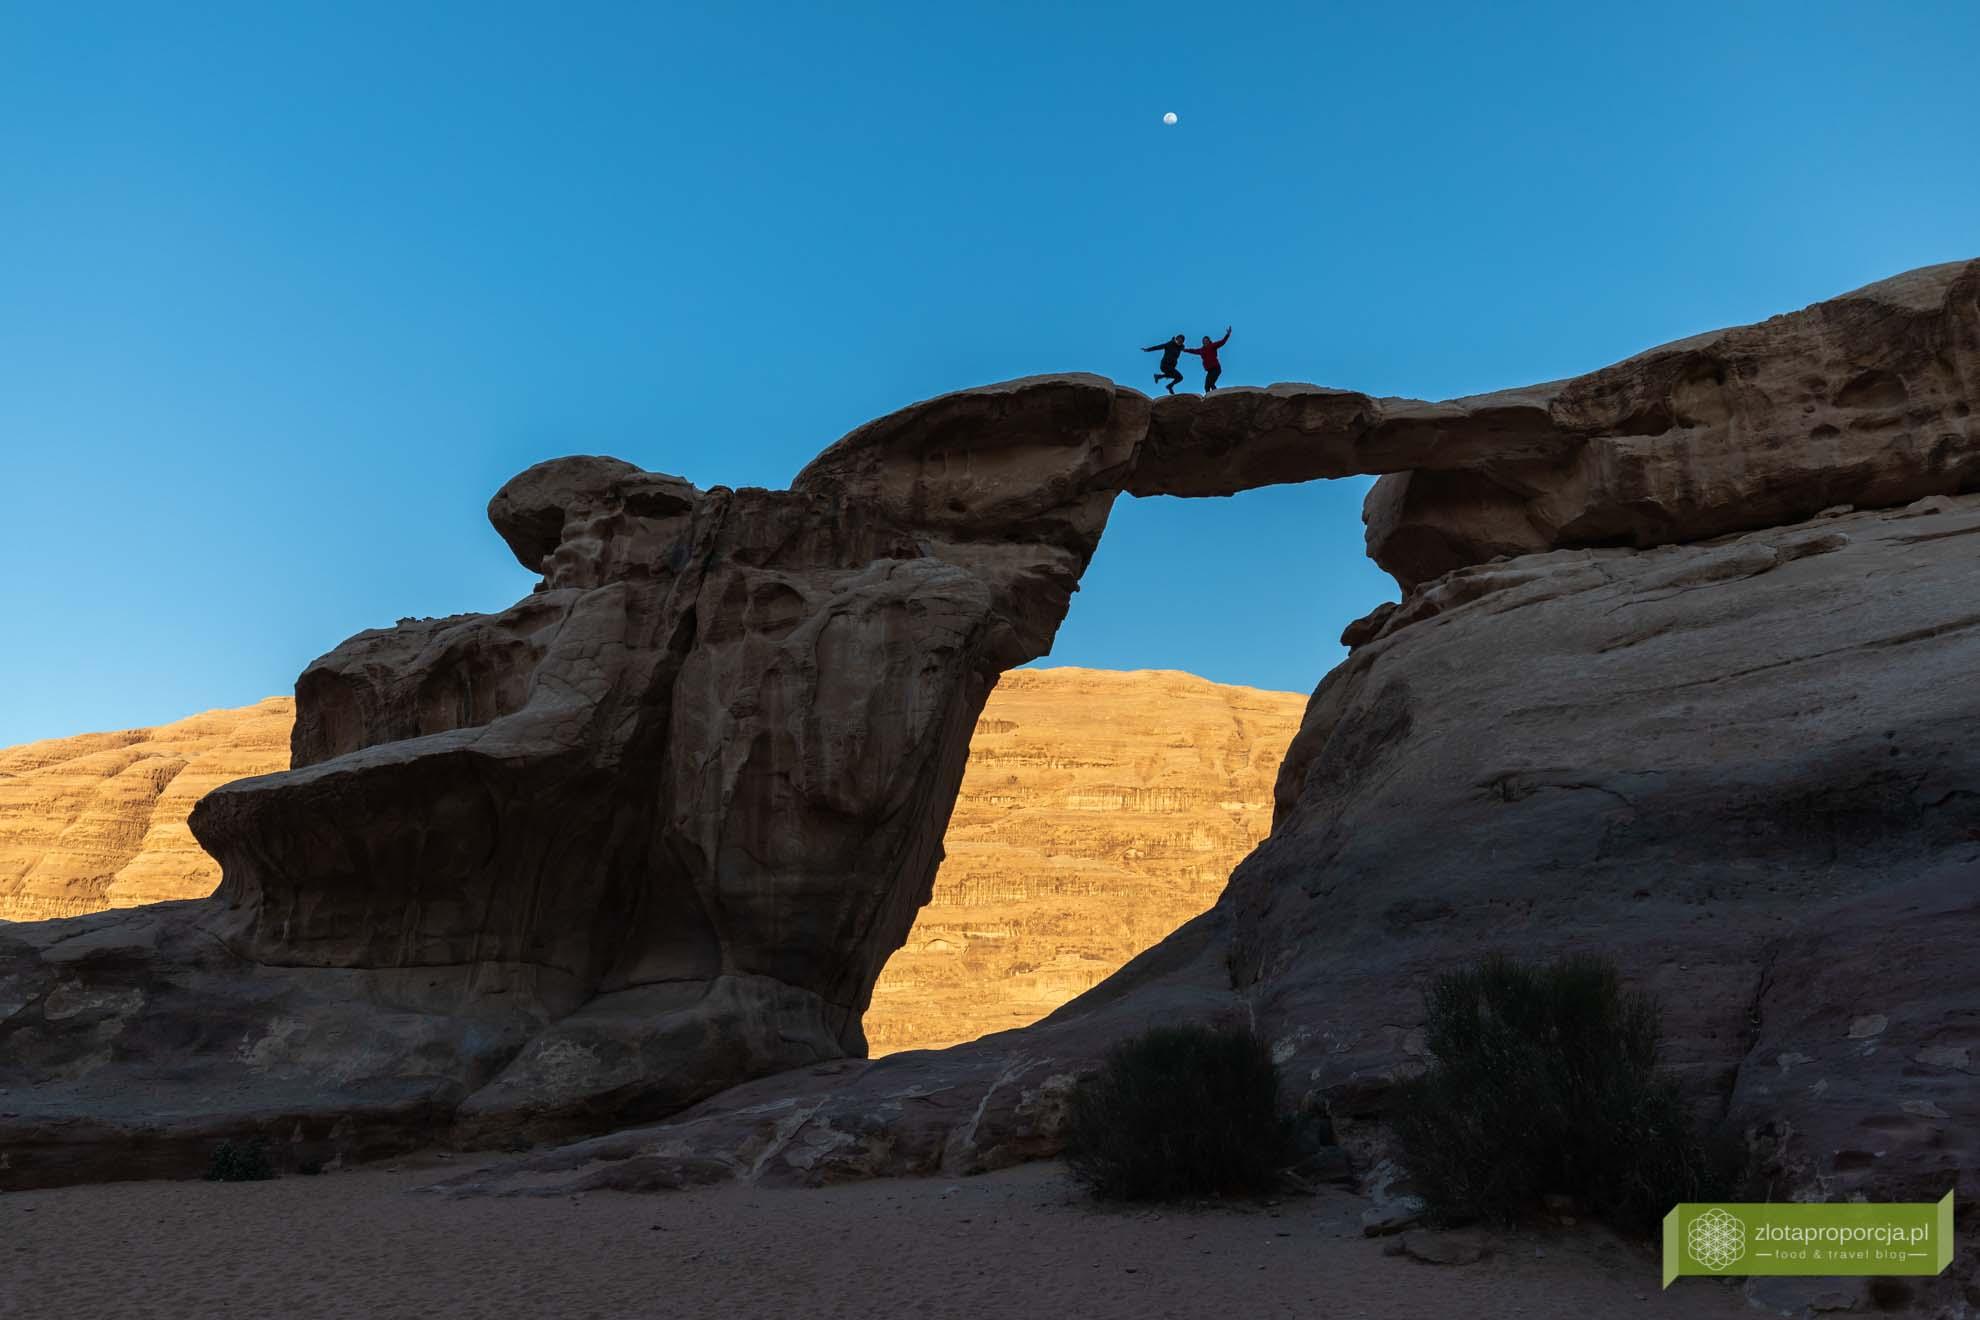 Wadi Rum, pustynia Wadi Rum, Jordania, pustynia Jordania; Wadi rum wycieczka, Wadi Rum zwiedzanie, Jordania atrakcje; Umm Fruth; łuk skalny Wadi Rum, łuk skalny Umm Fruth;